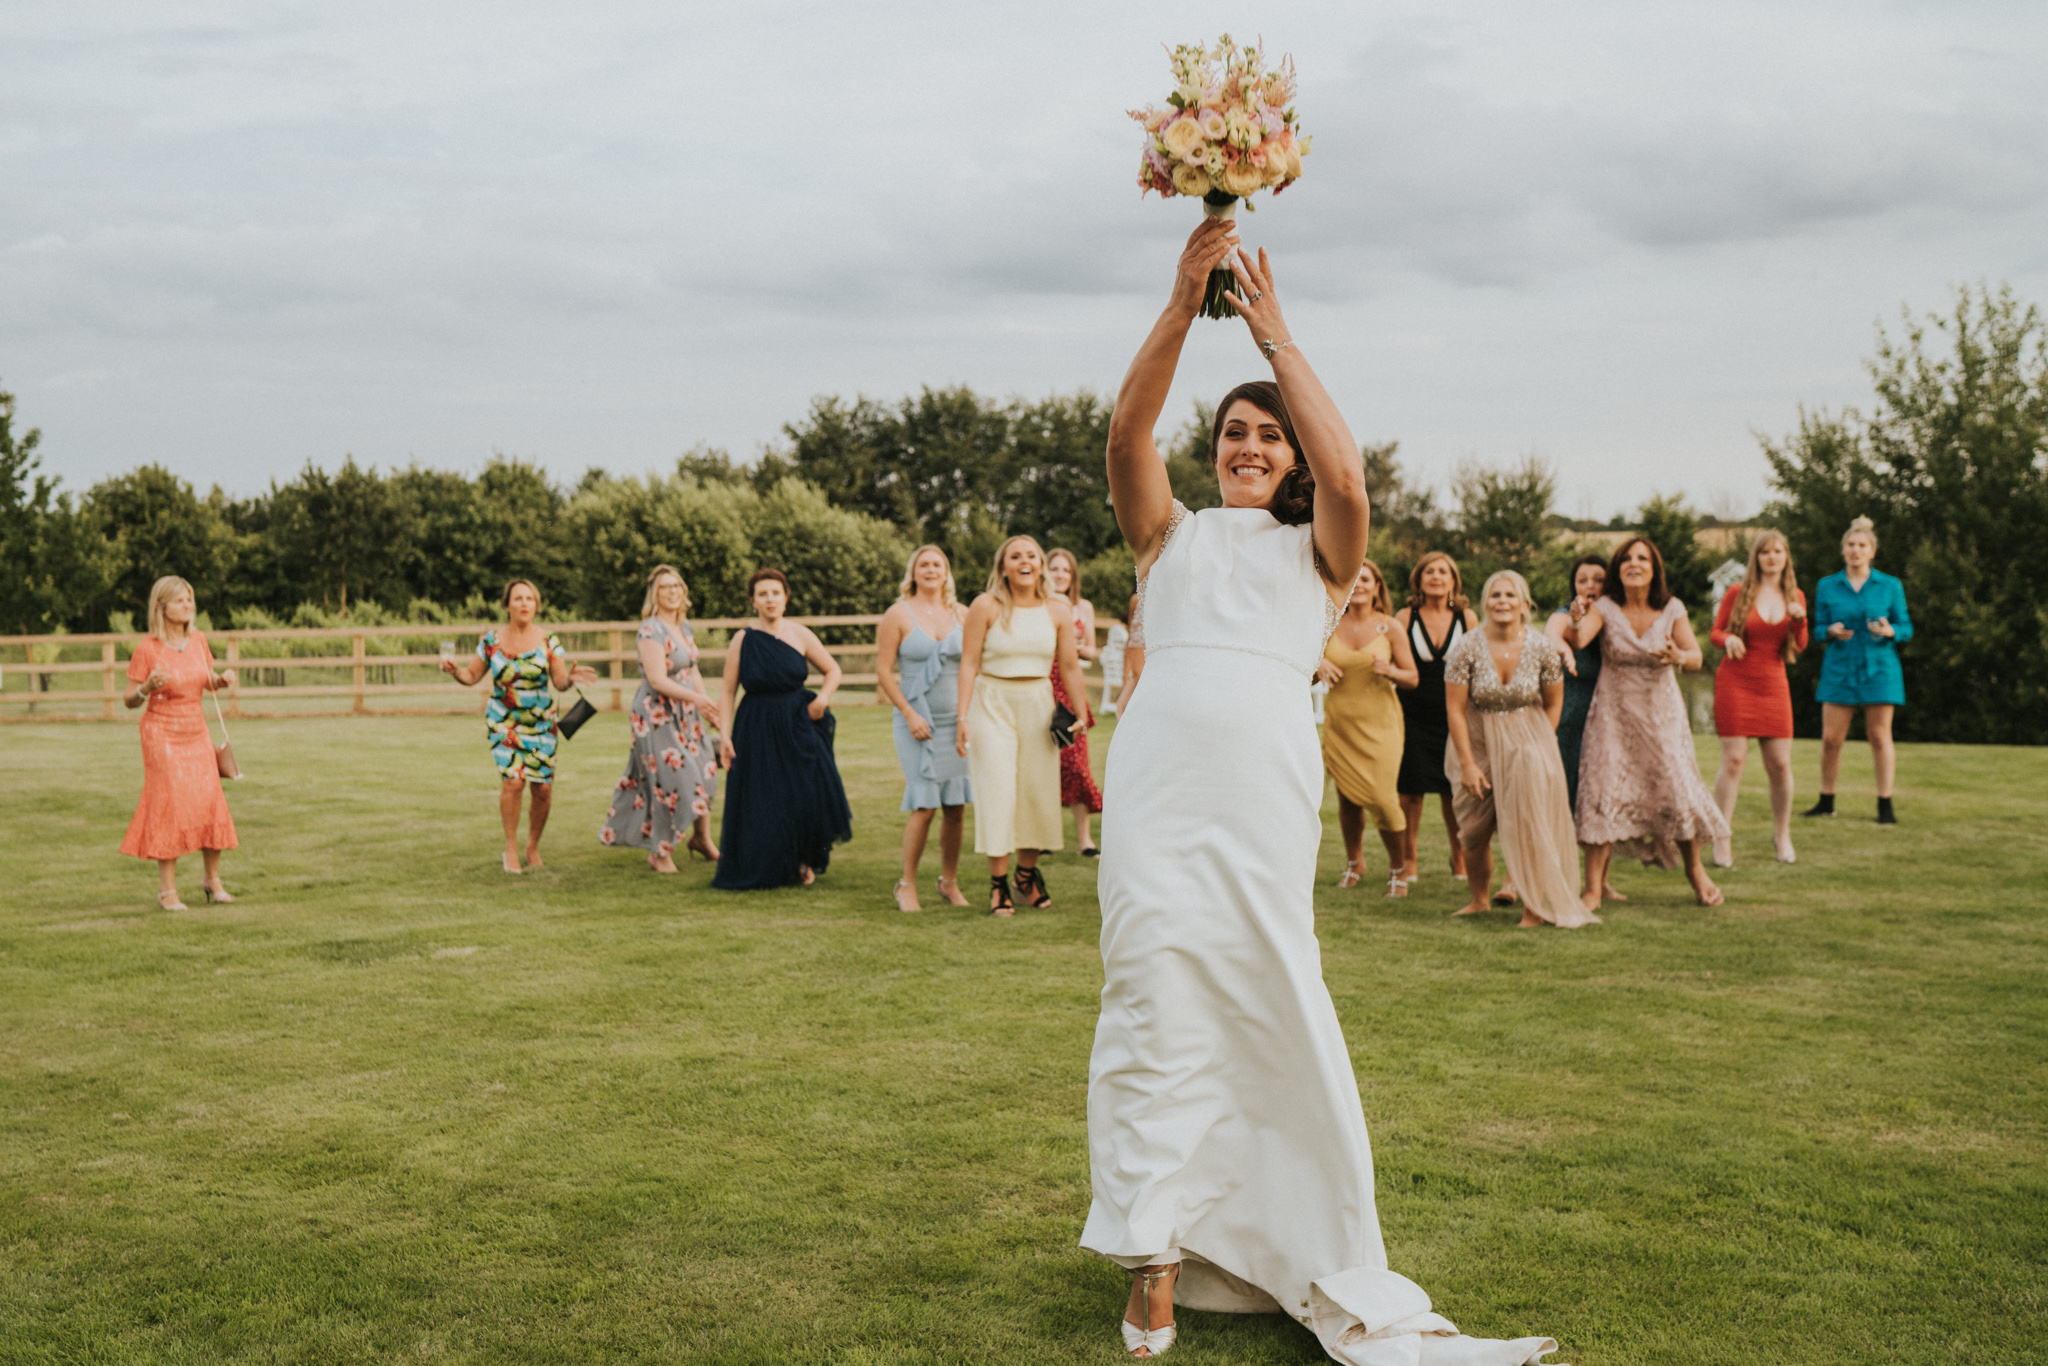 danielle-and-gareths-boho-wedding-previews-at-high-house-weddings-grace-elizabeth-colchester-essex-suffolk-norfolk-devon-alternative-wedding-and-lifestyle-photographer (69 of 76).jpg